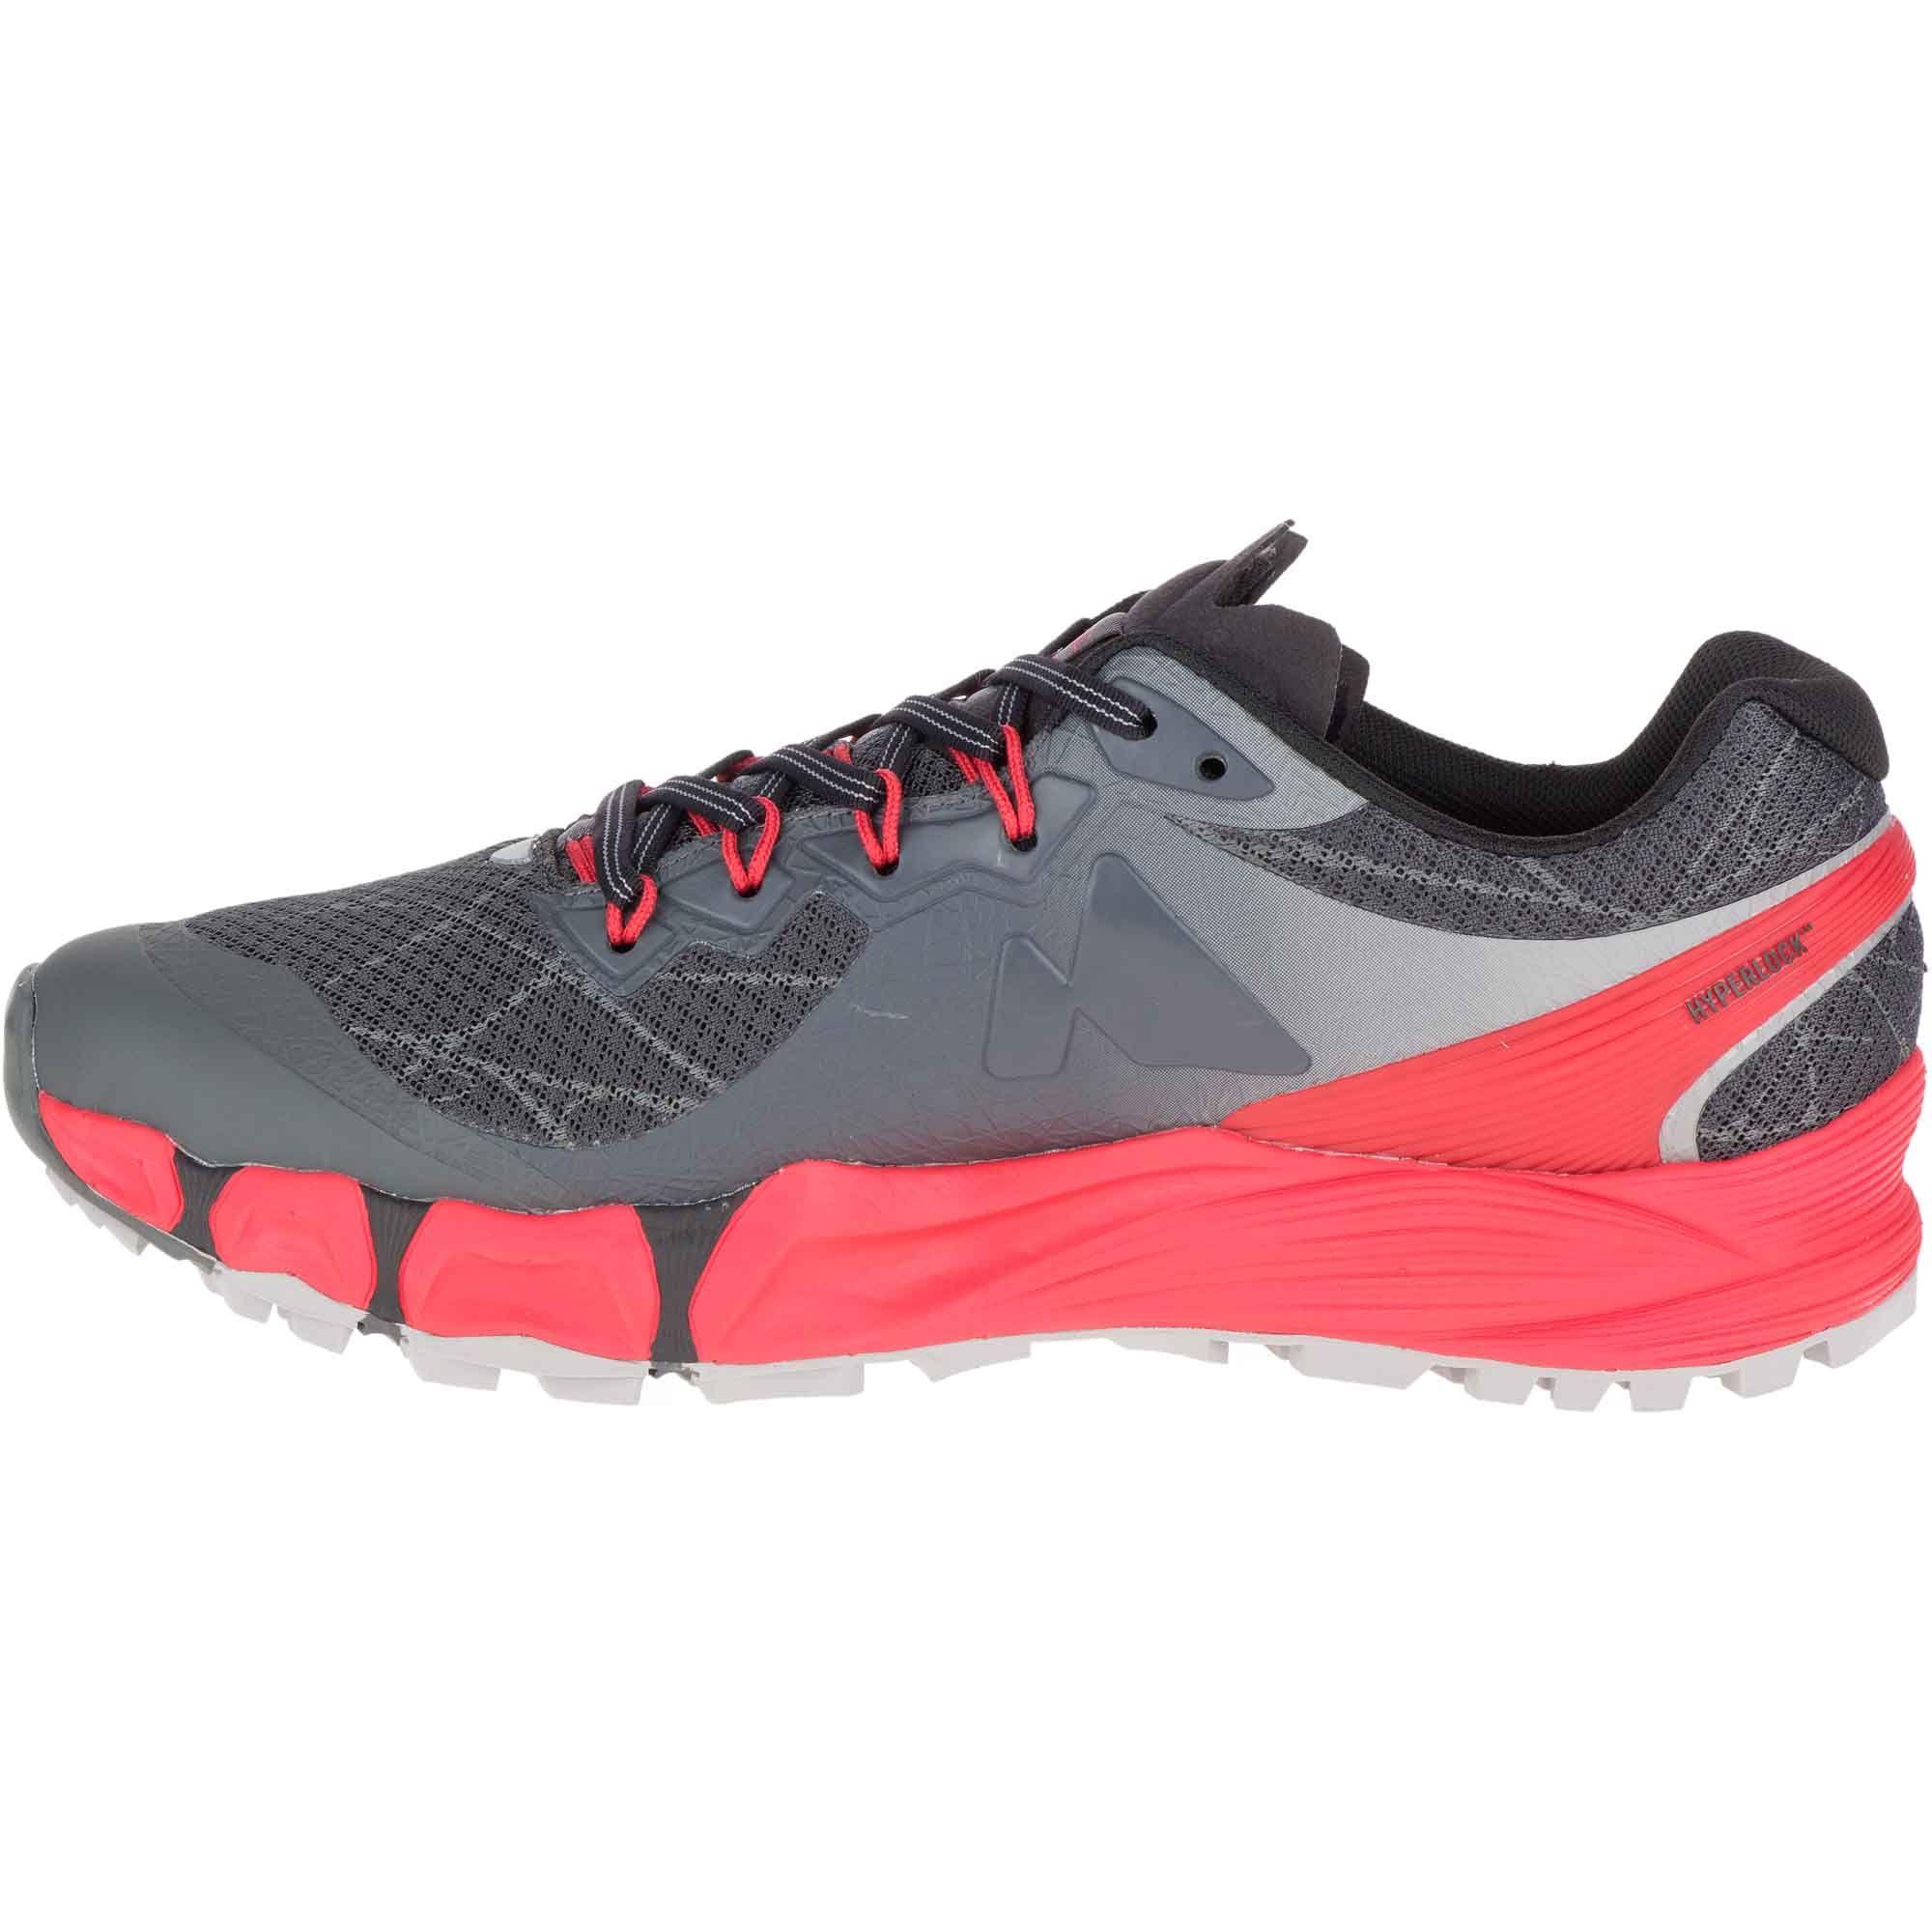 Merrell Agility Peak Flex Mens Running Shoes AW17